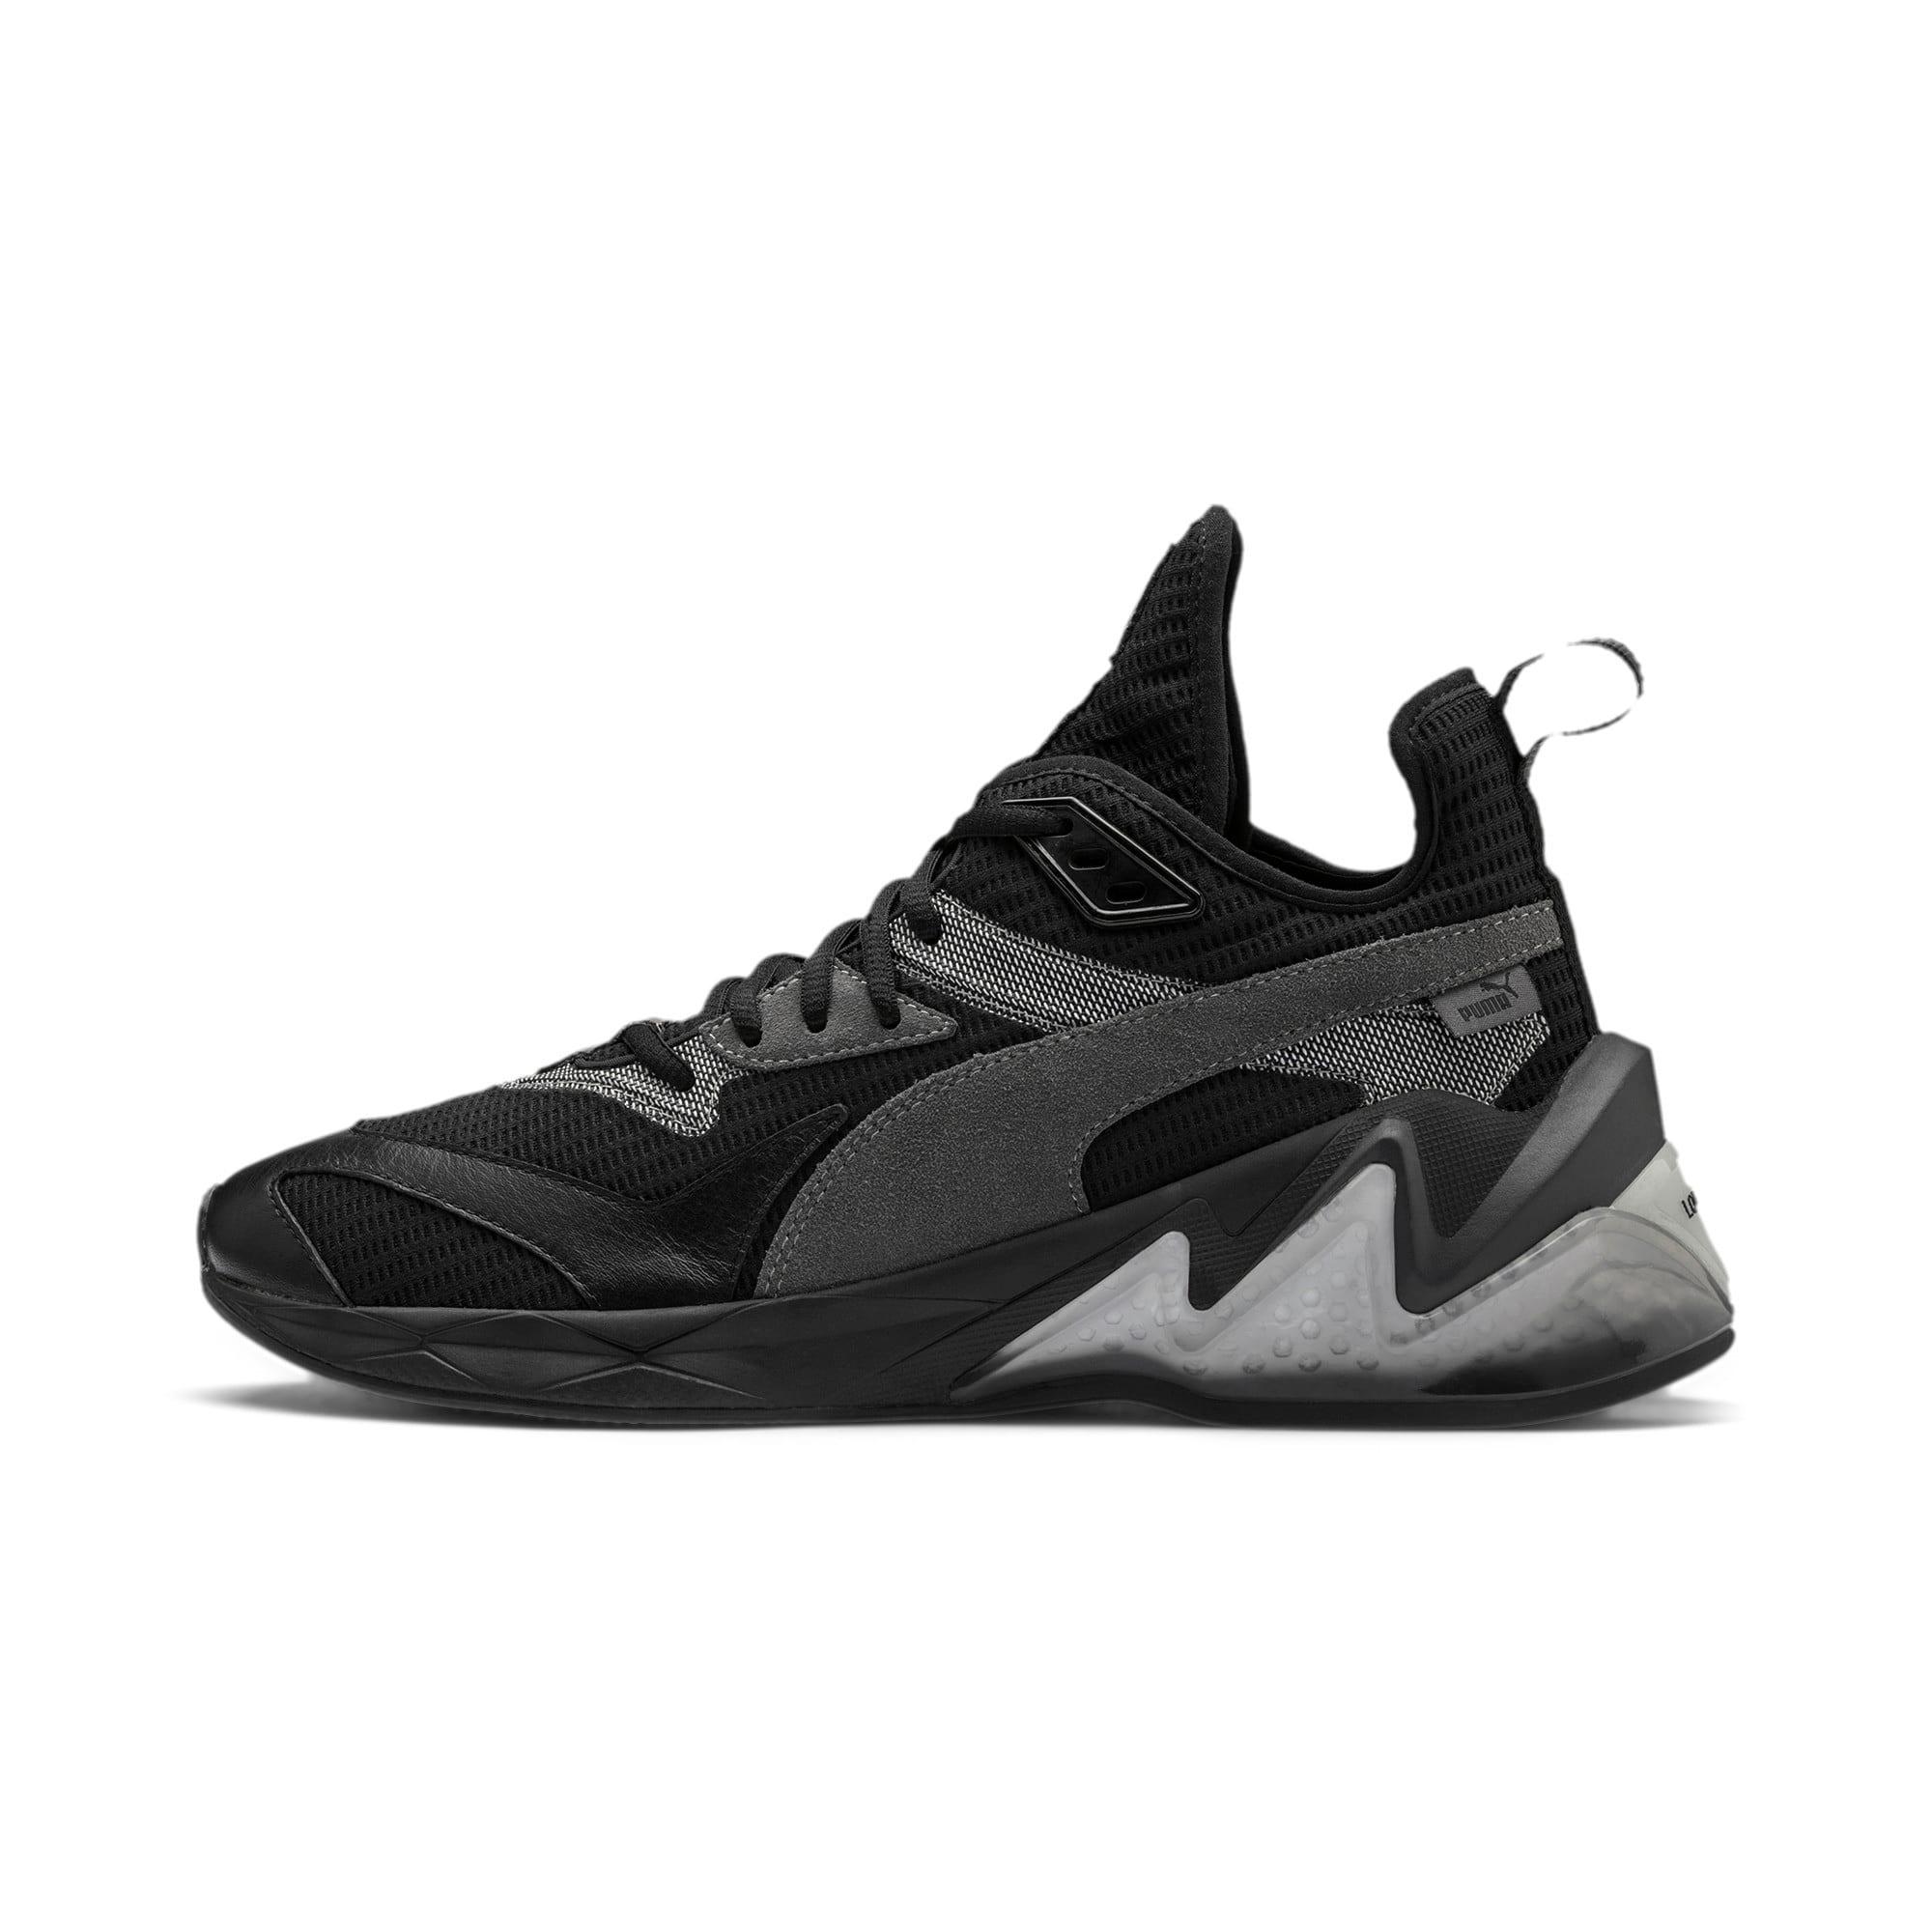 Thumbnail 1 of LQDCELL Origin Men's Training Shoes, Puma Black-Asphalt, medium